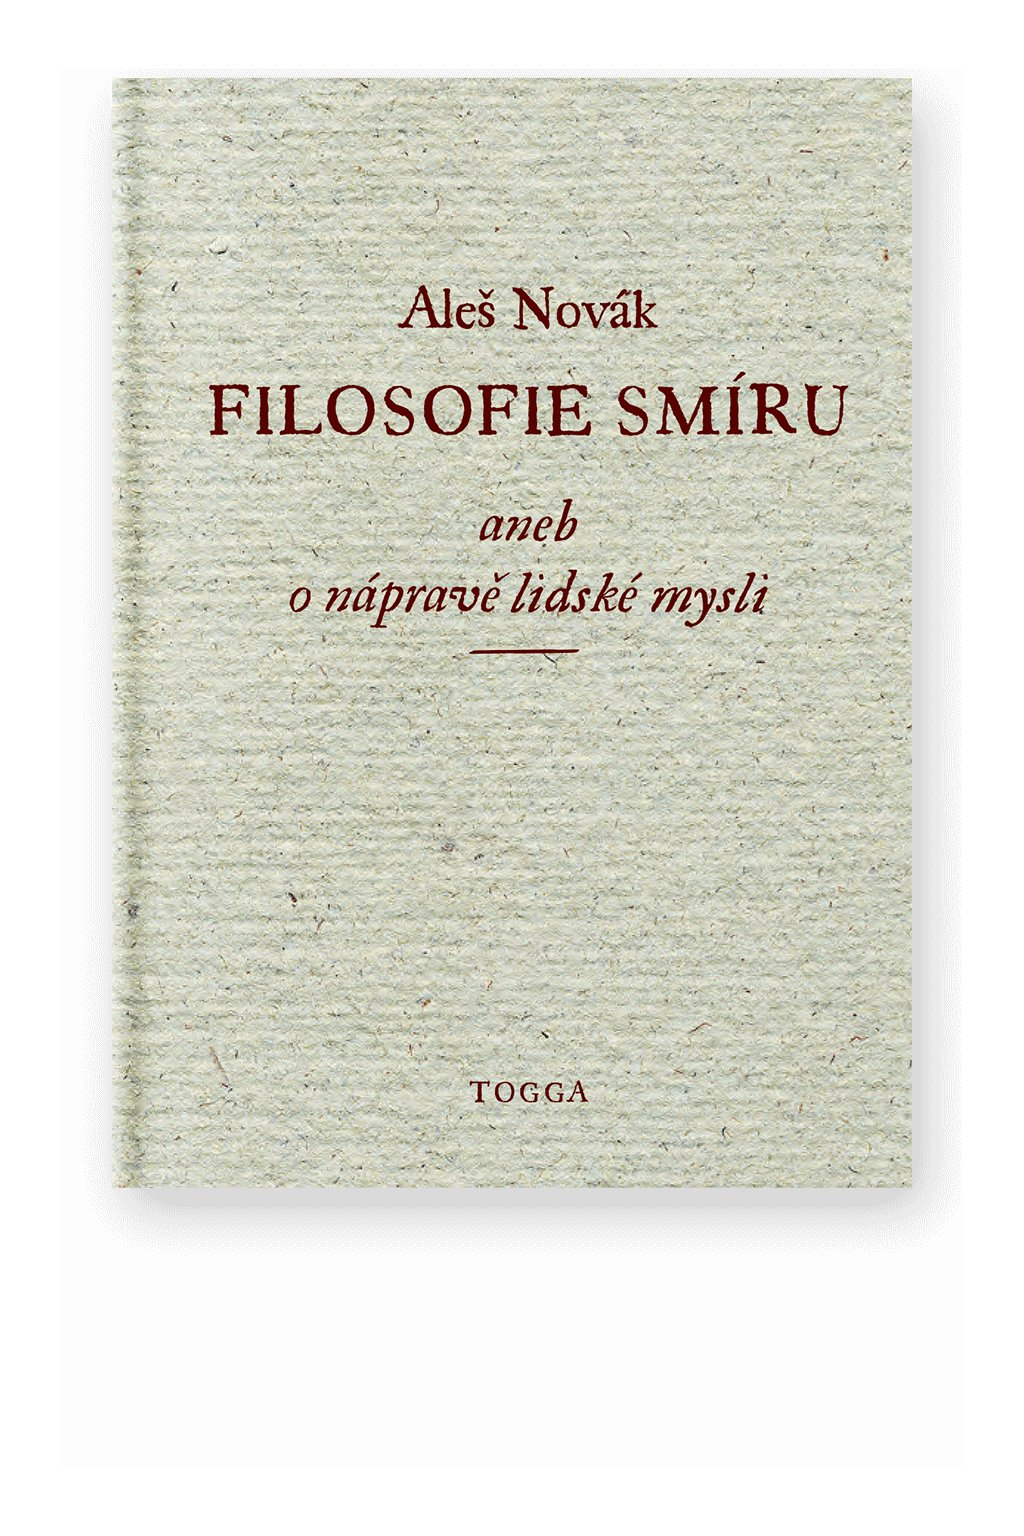 963 1 filosofie smiru